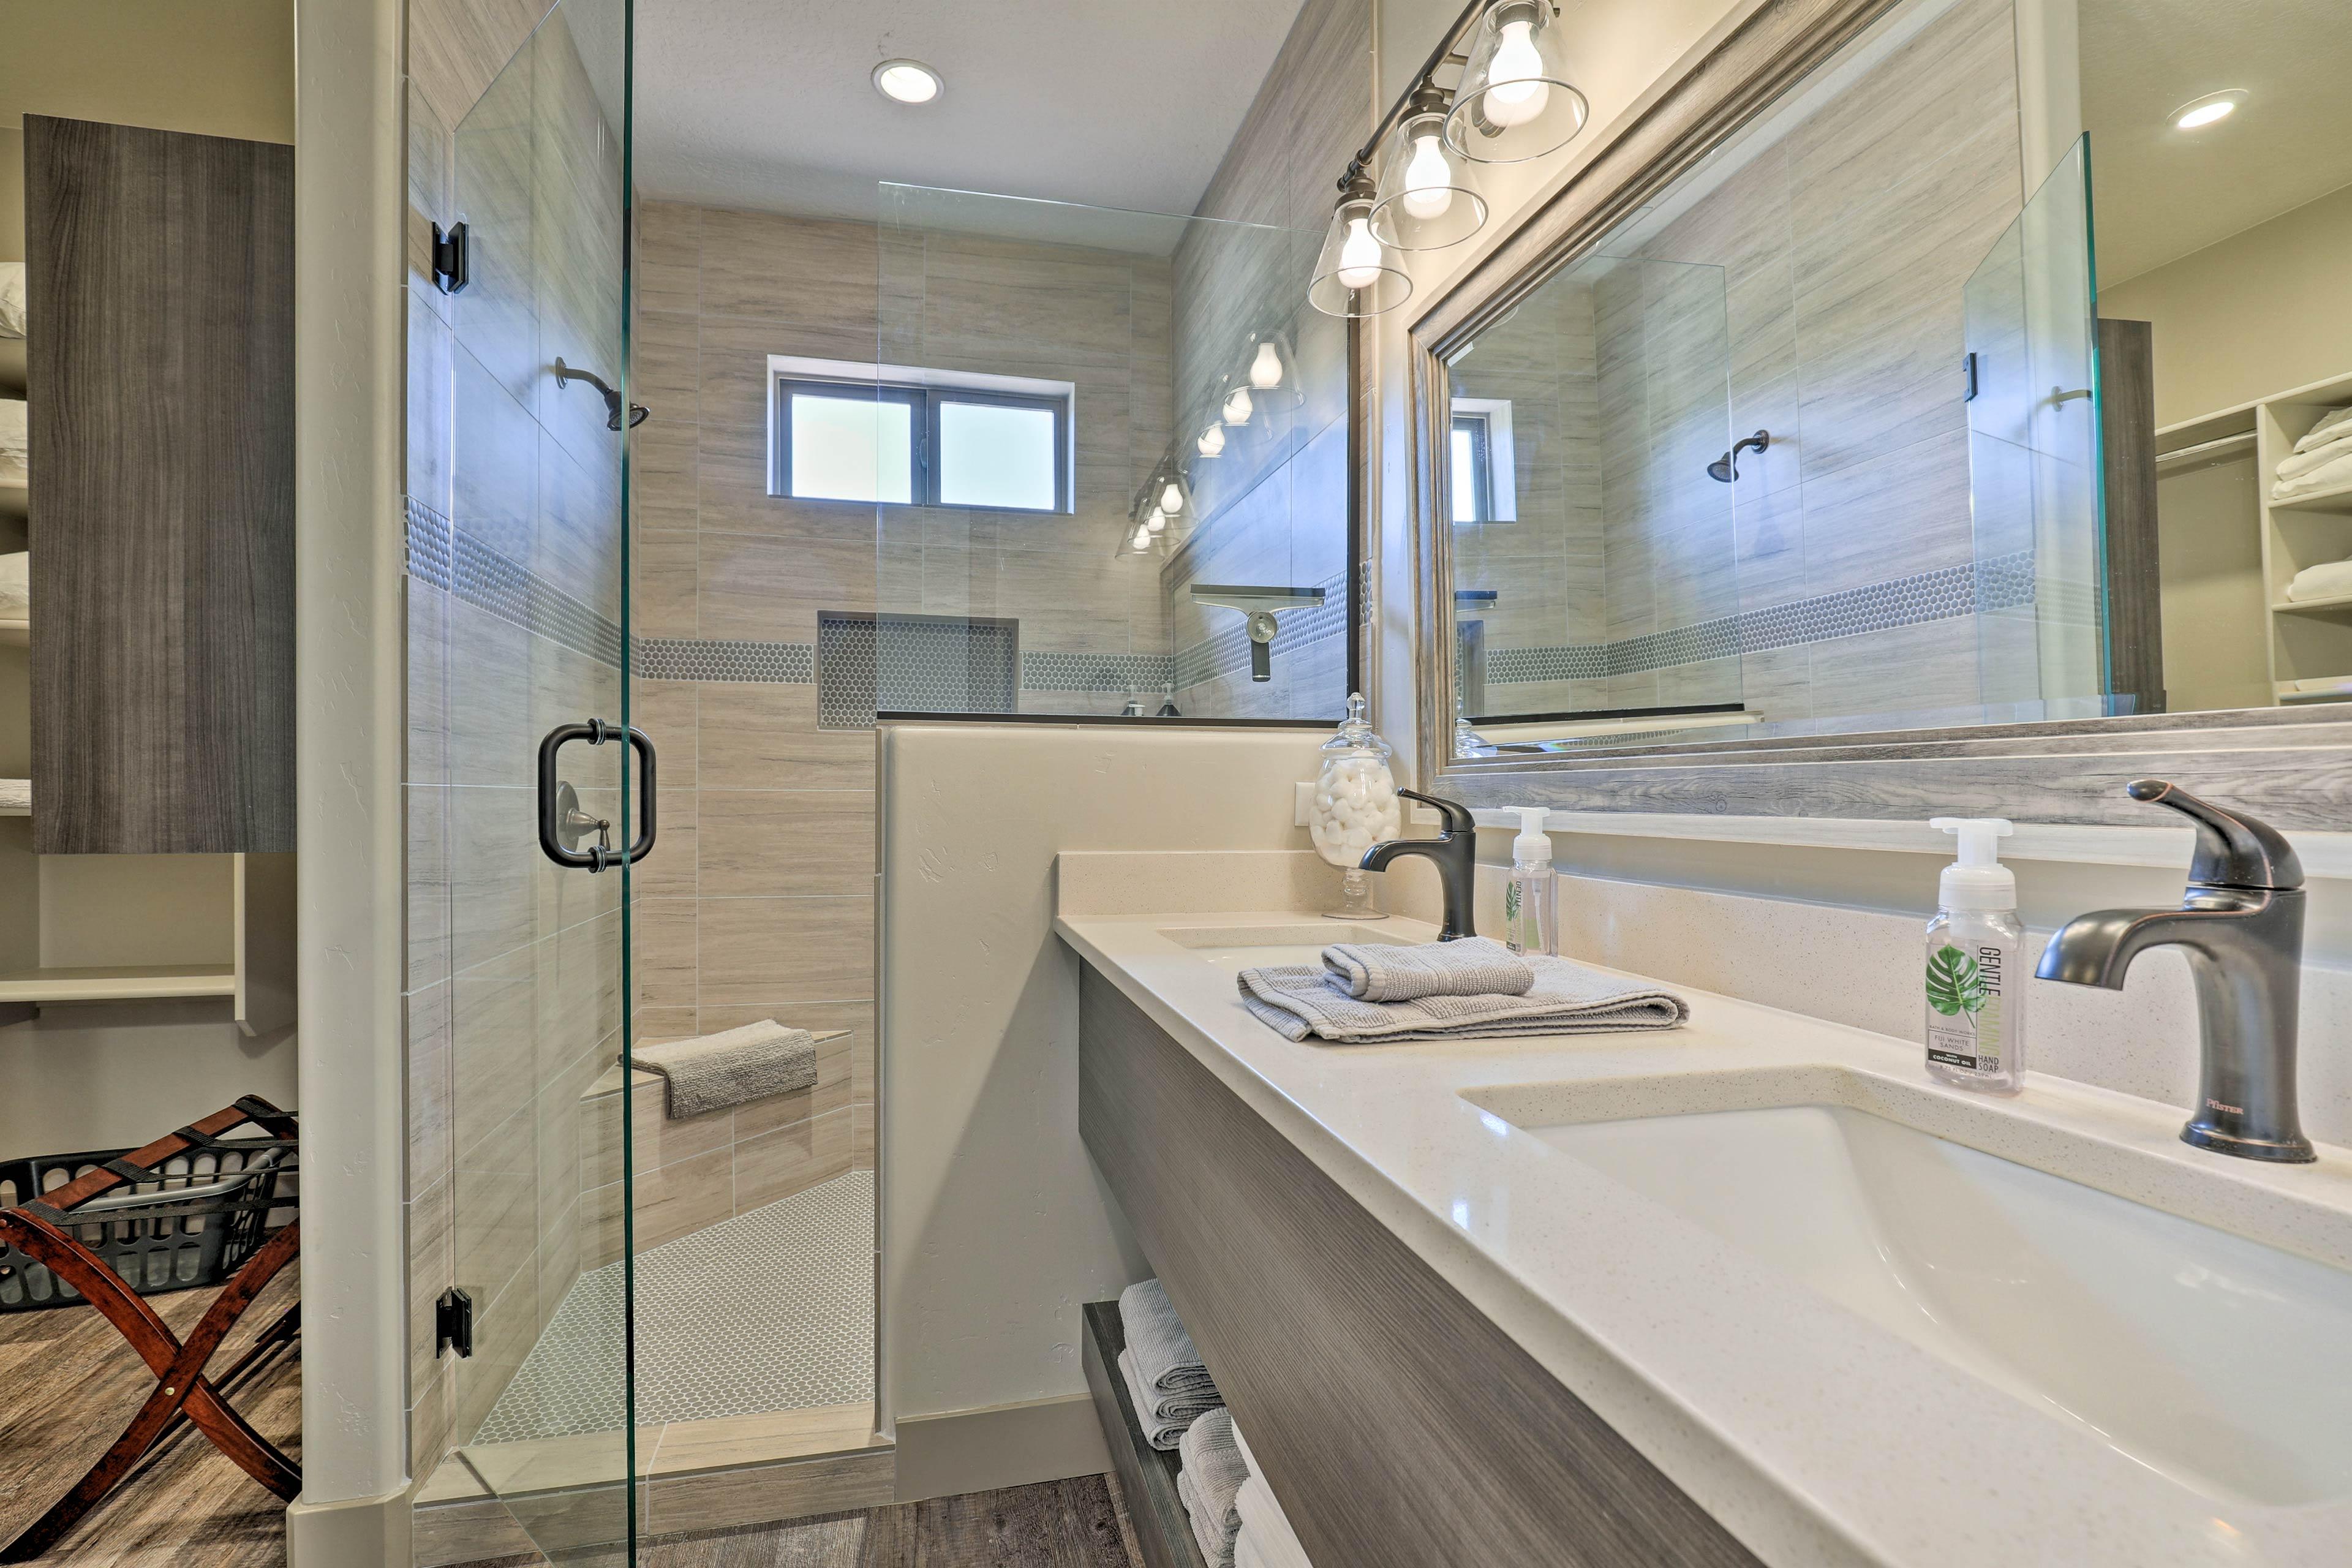 The master bedroom offers an elegant en-suite bathroom with a walk-in shower.